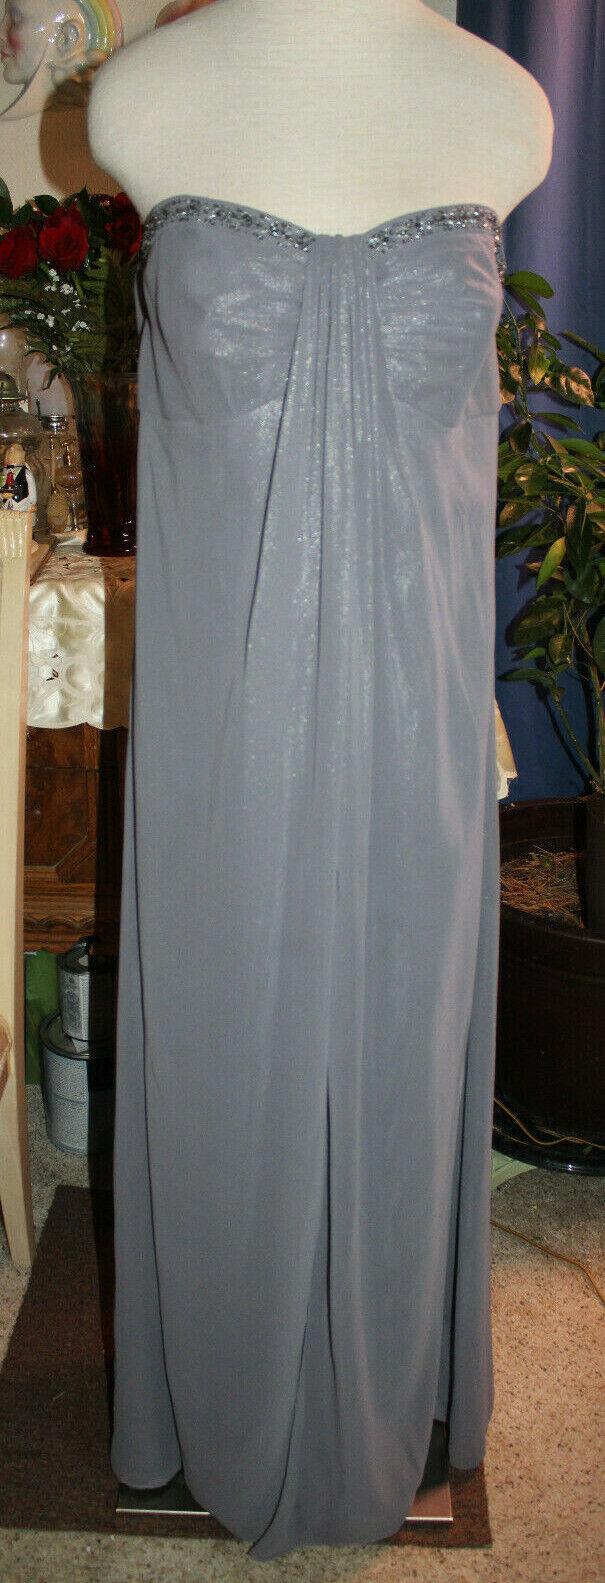 Davids Bridal pewter gray shiny chiffon formal bridesmaids wedding long dress 18